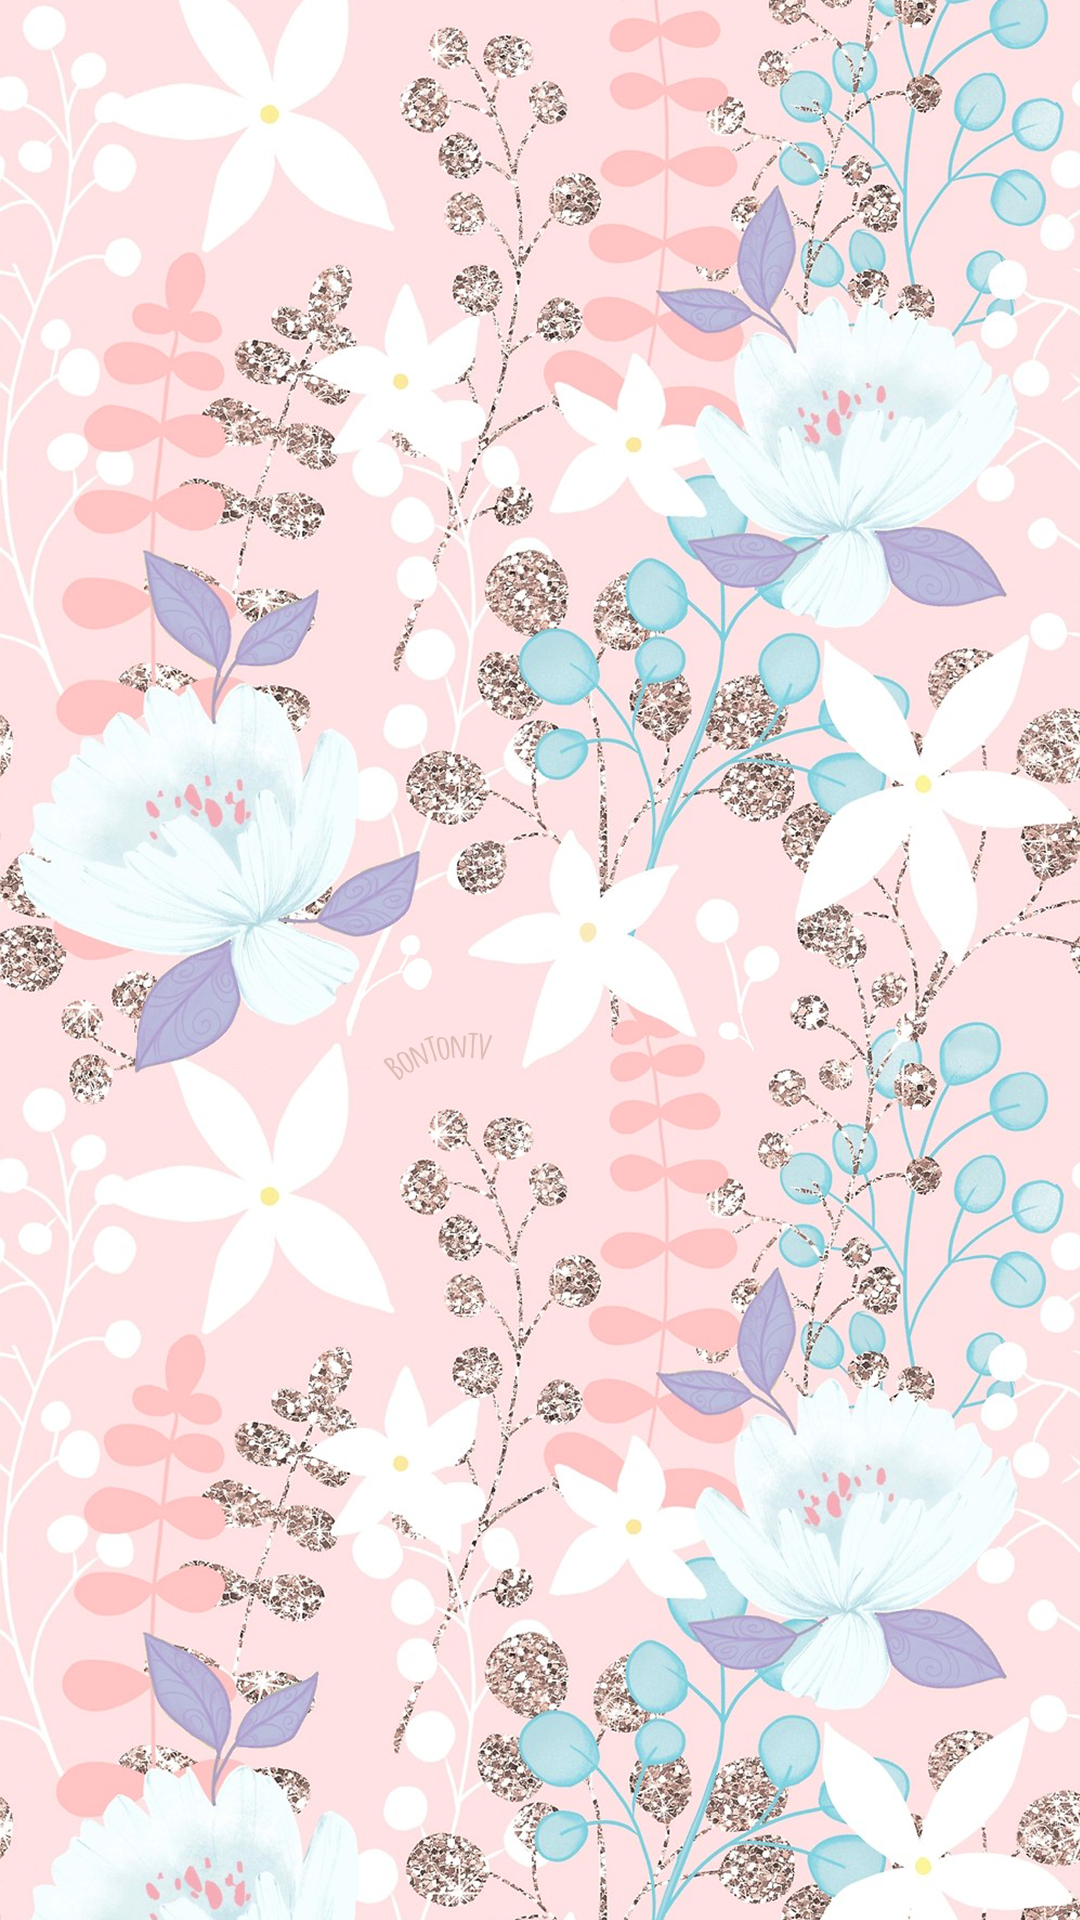 Background Tumblr Hd Pastel